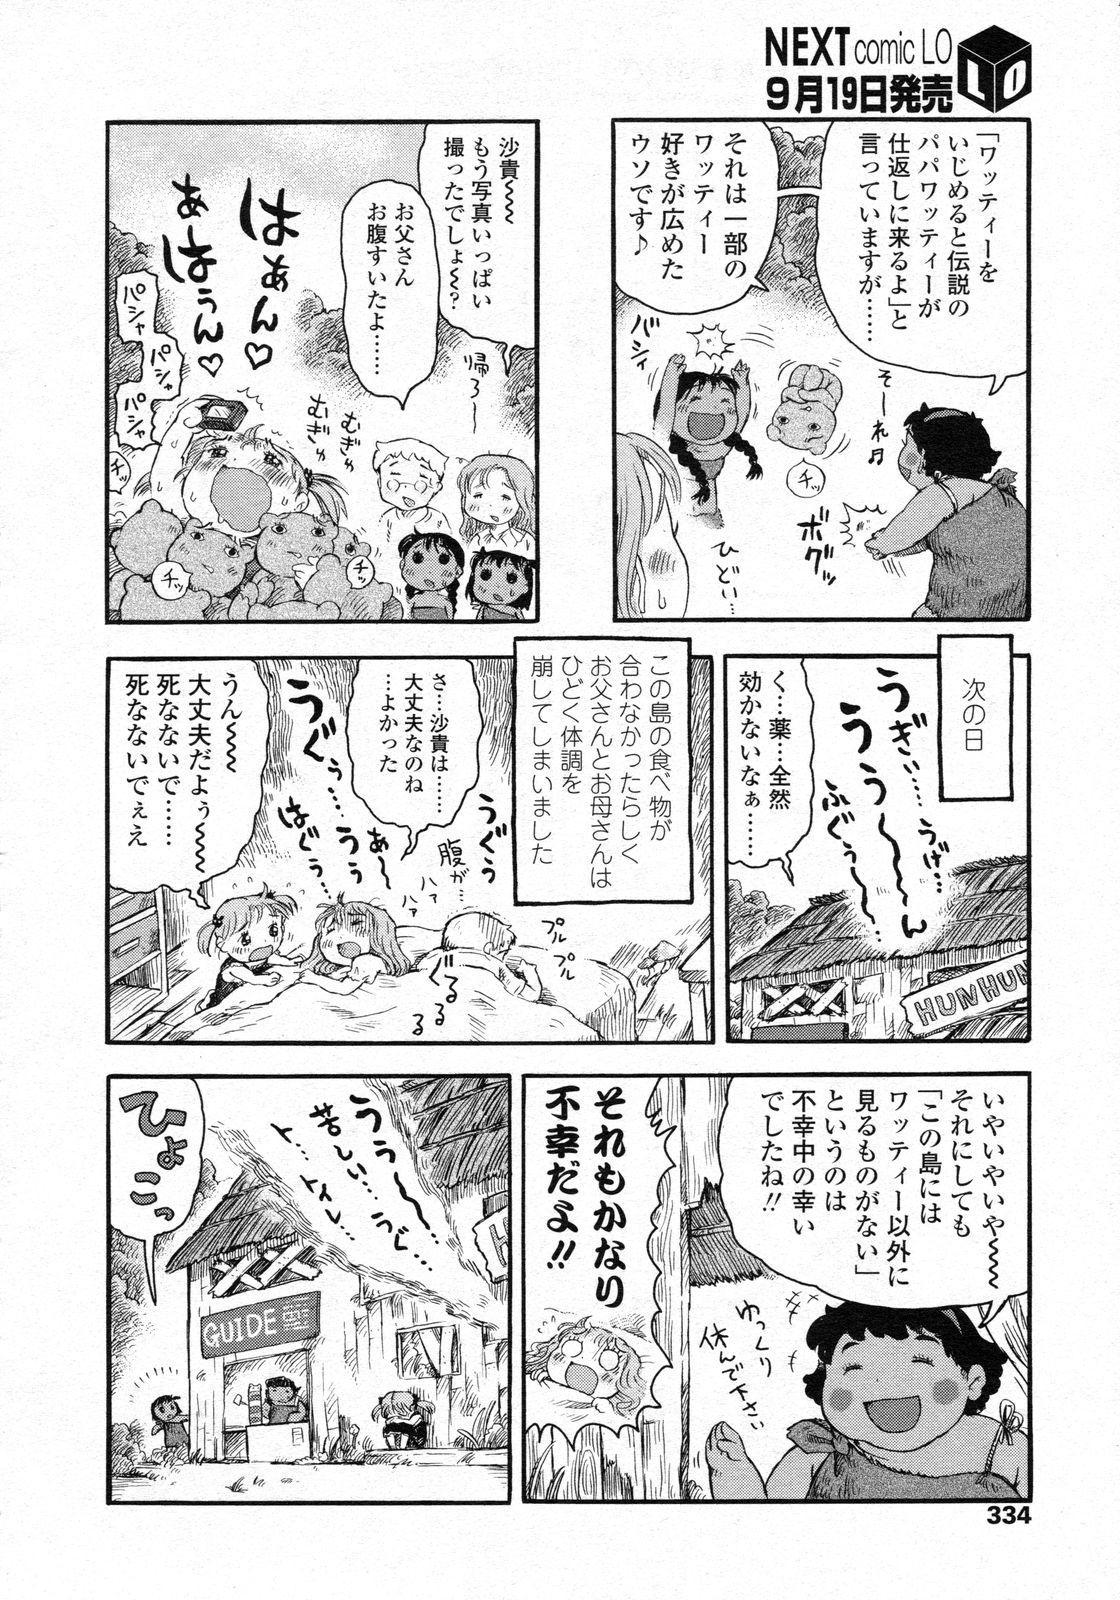 COMIC LO 2009-10 Vol. 67 334